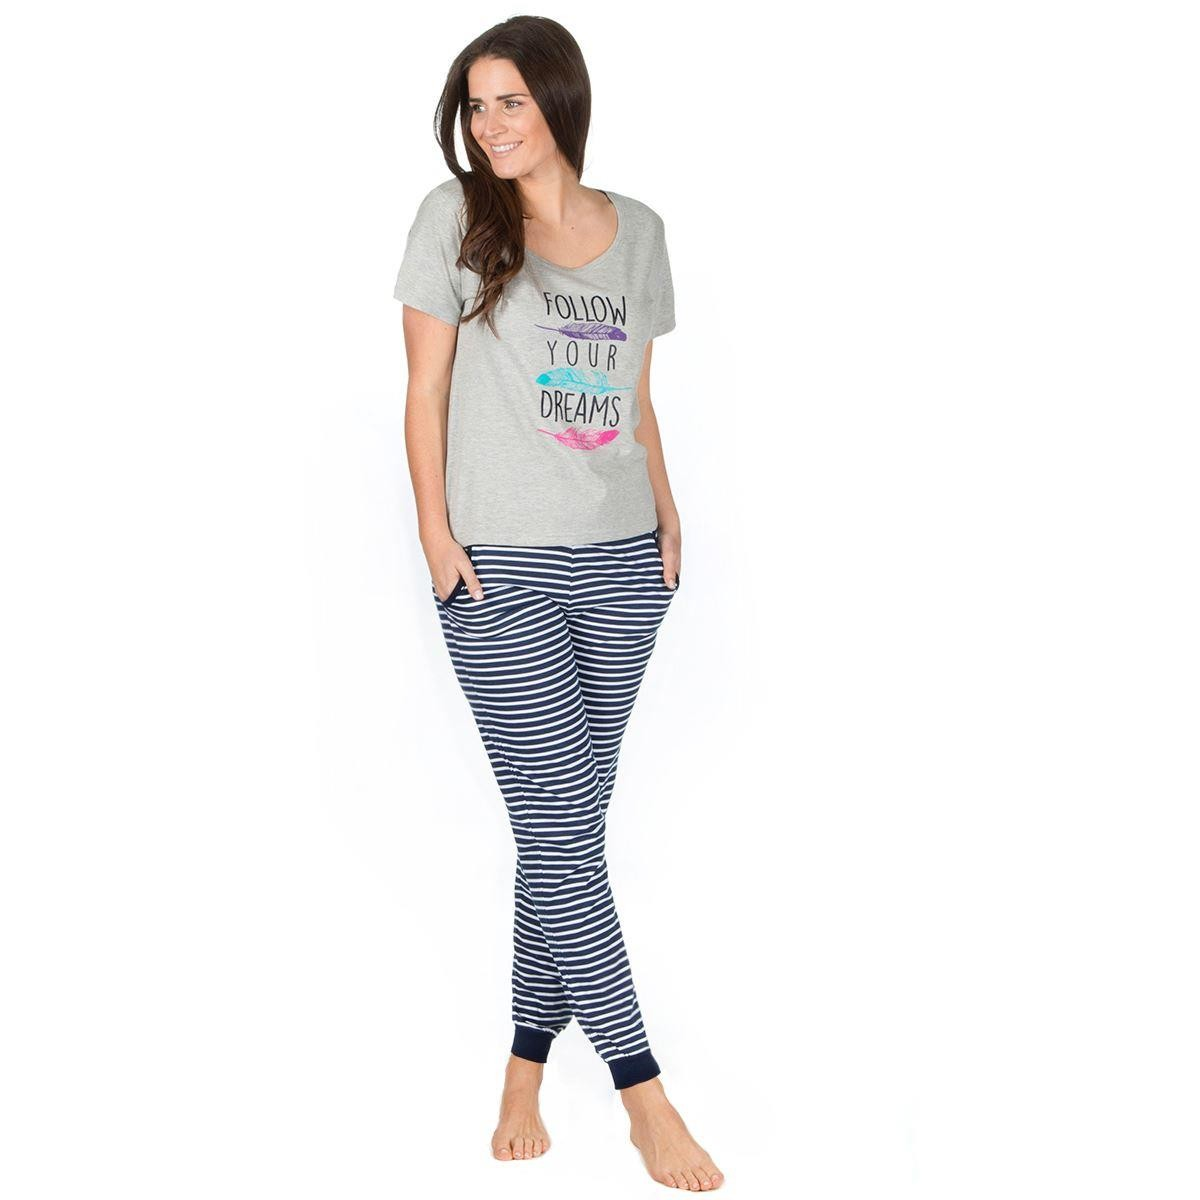 Forever Dreaming 'Follow Your Dreams' Pyjama Set - Grey